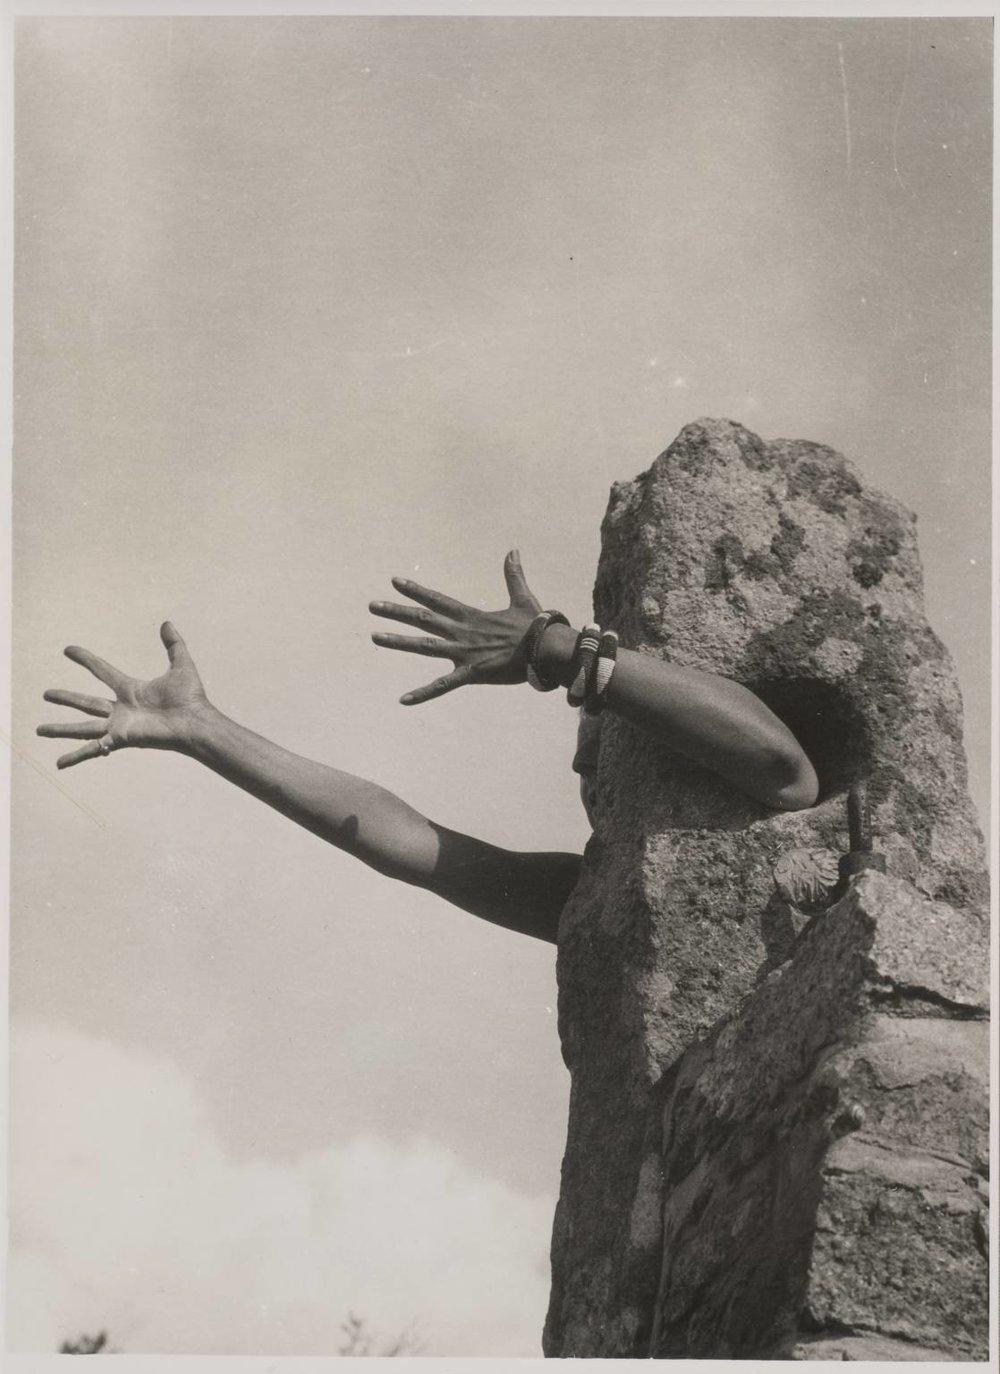 Claude Cahun, I Extend My Arms, 1931-32